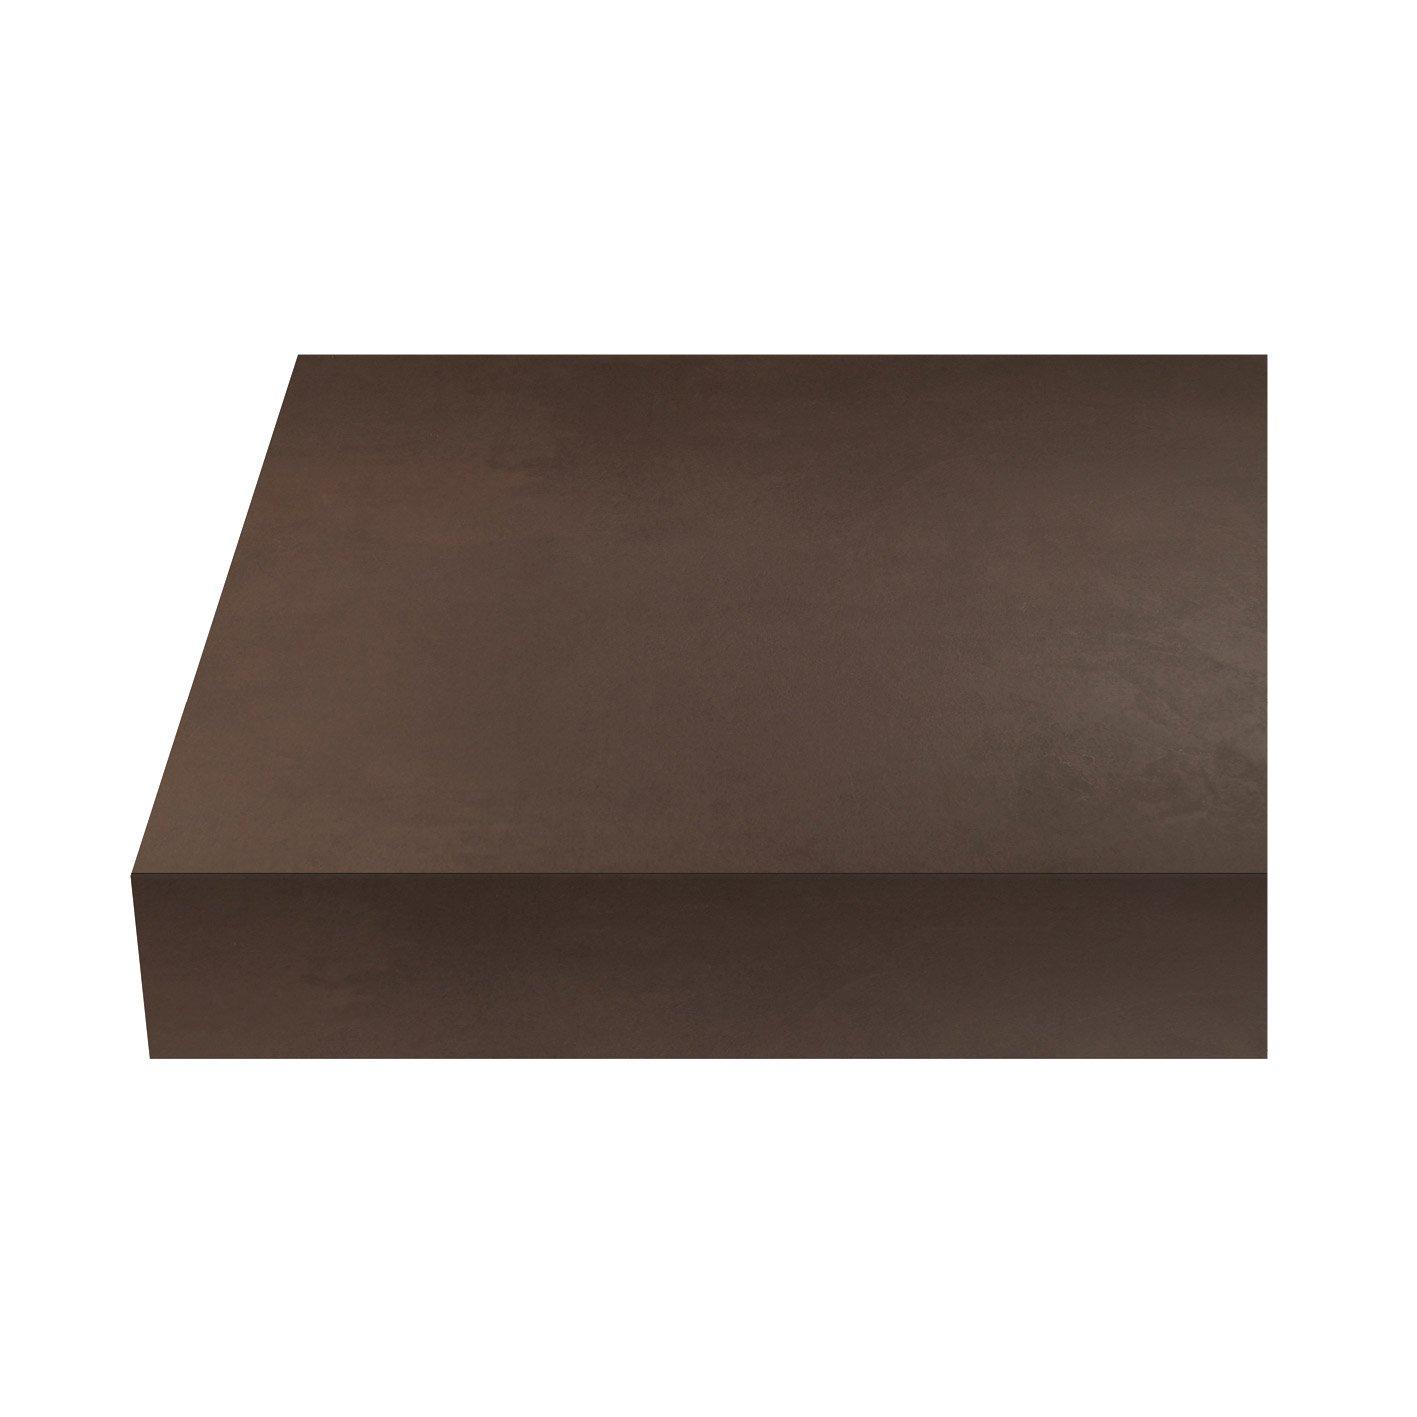 plan de travail stratifi beton cire marron mat x p. Black Bedroom Furniture Sets. Home Design Ideas